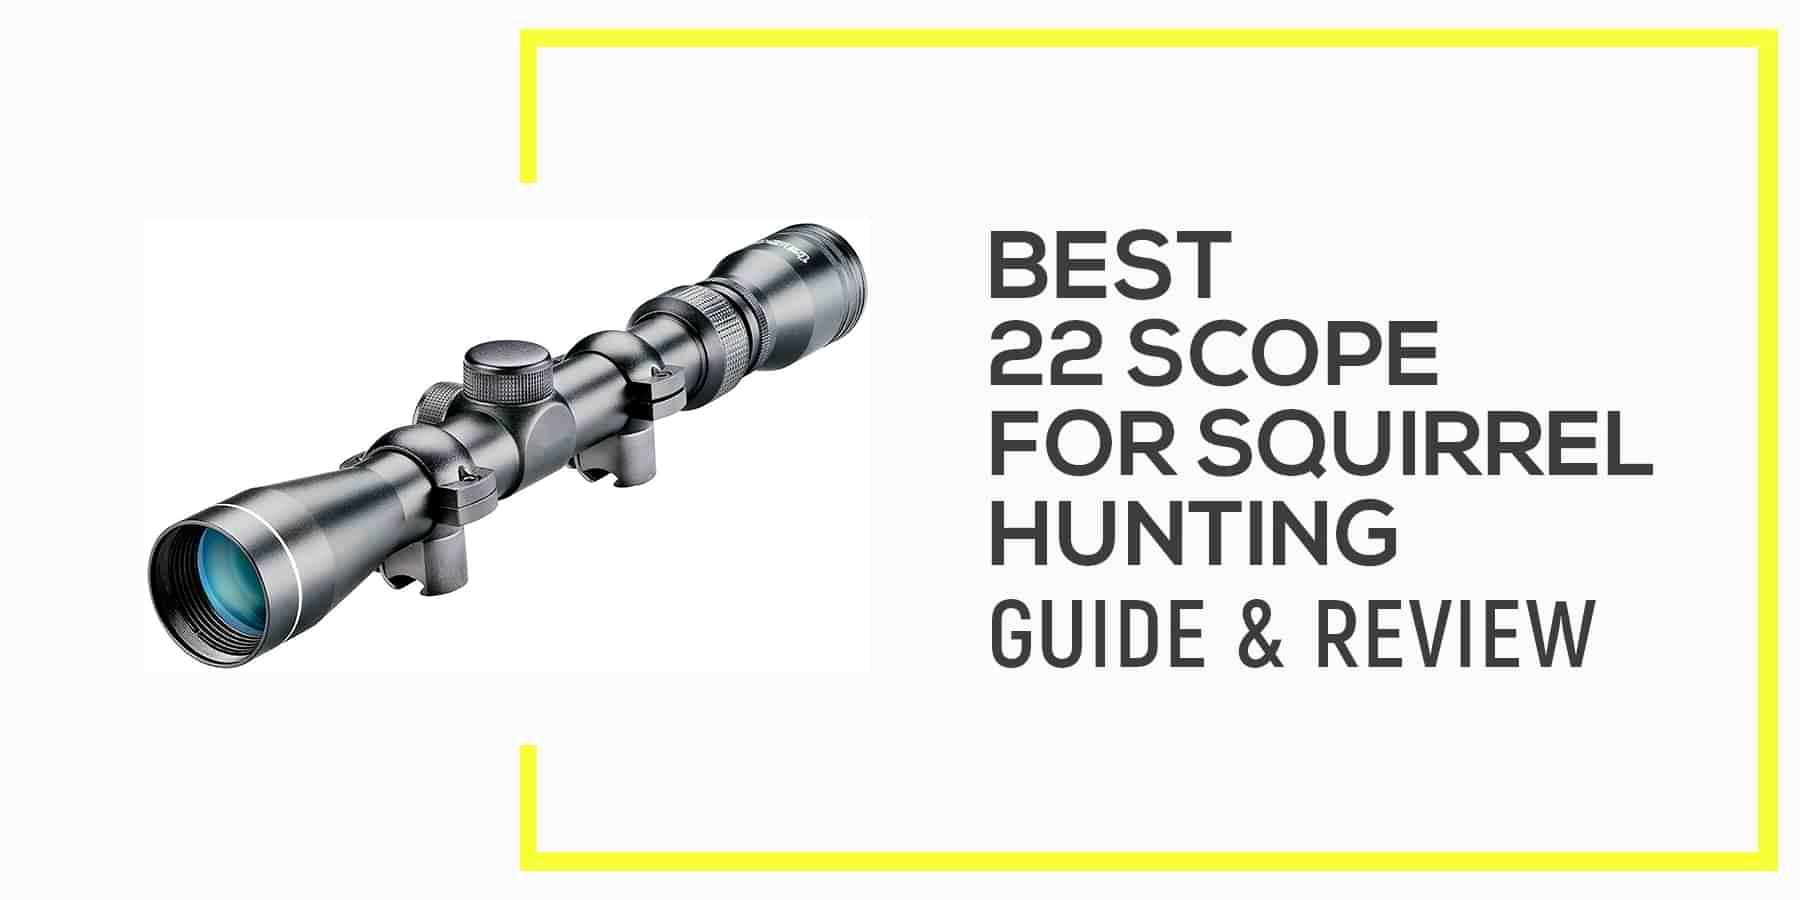 Best 22 Scope